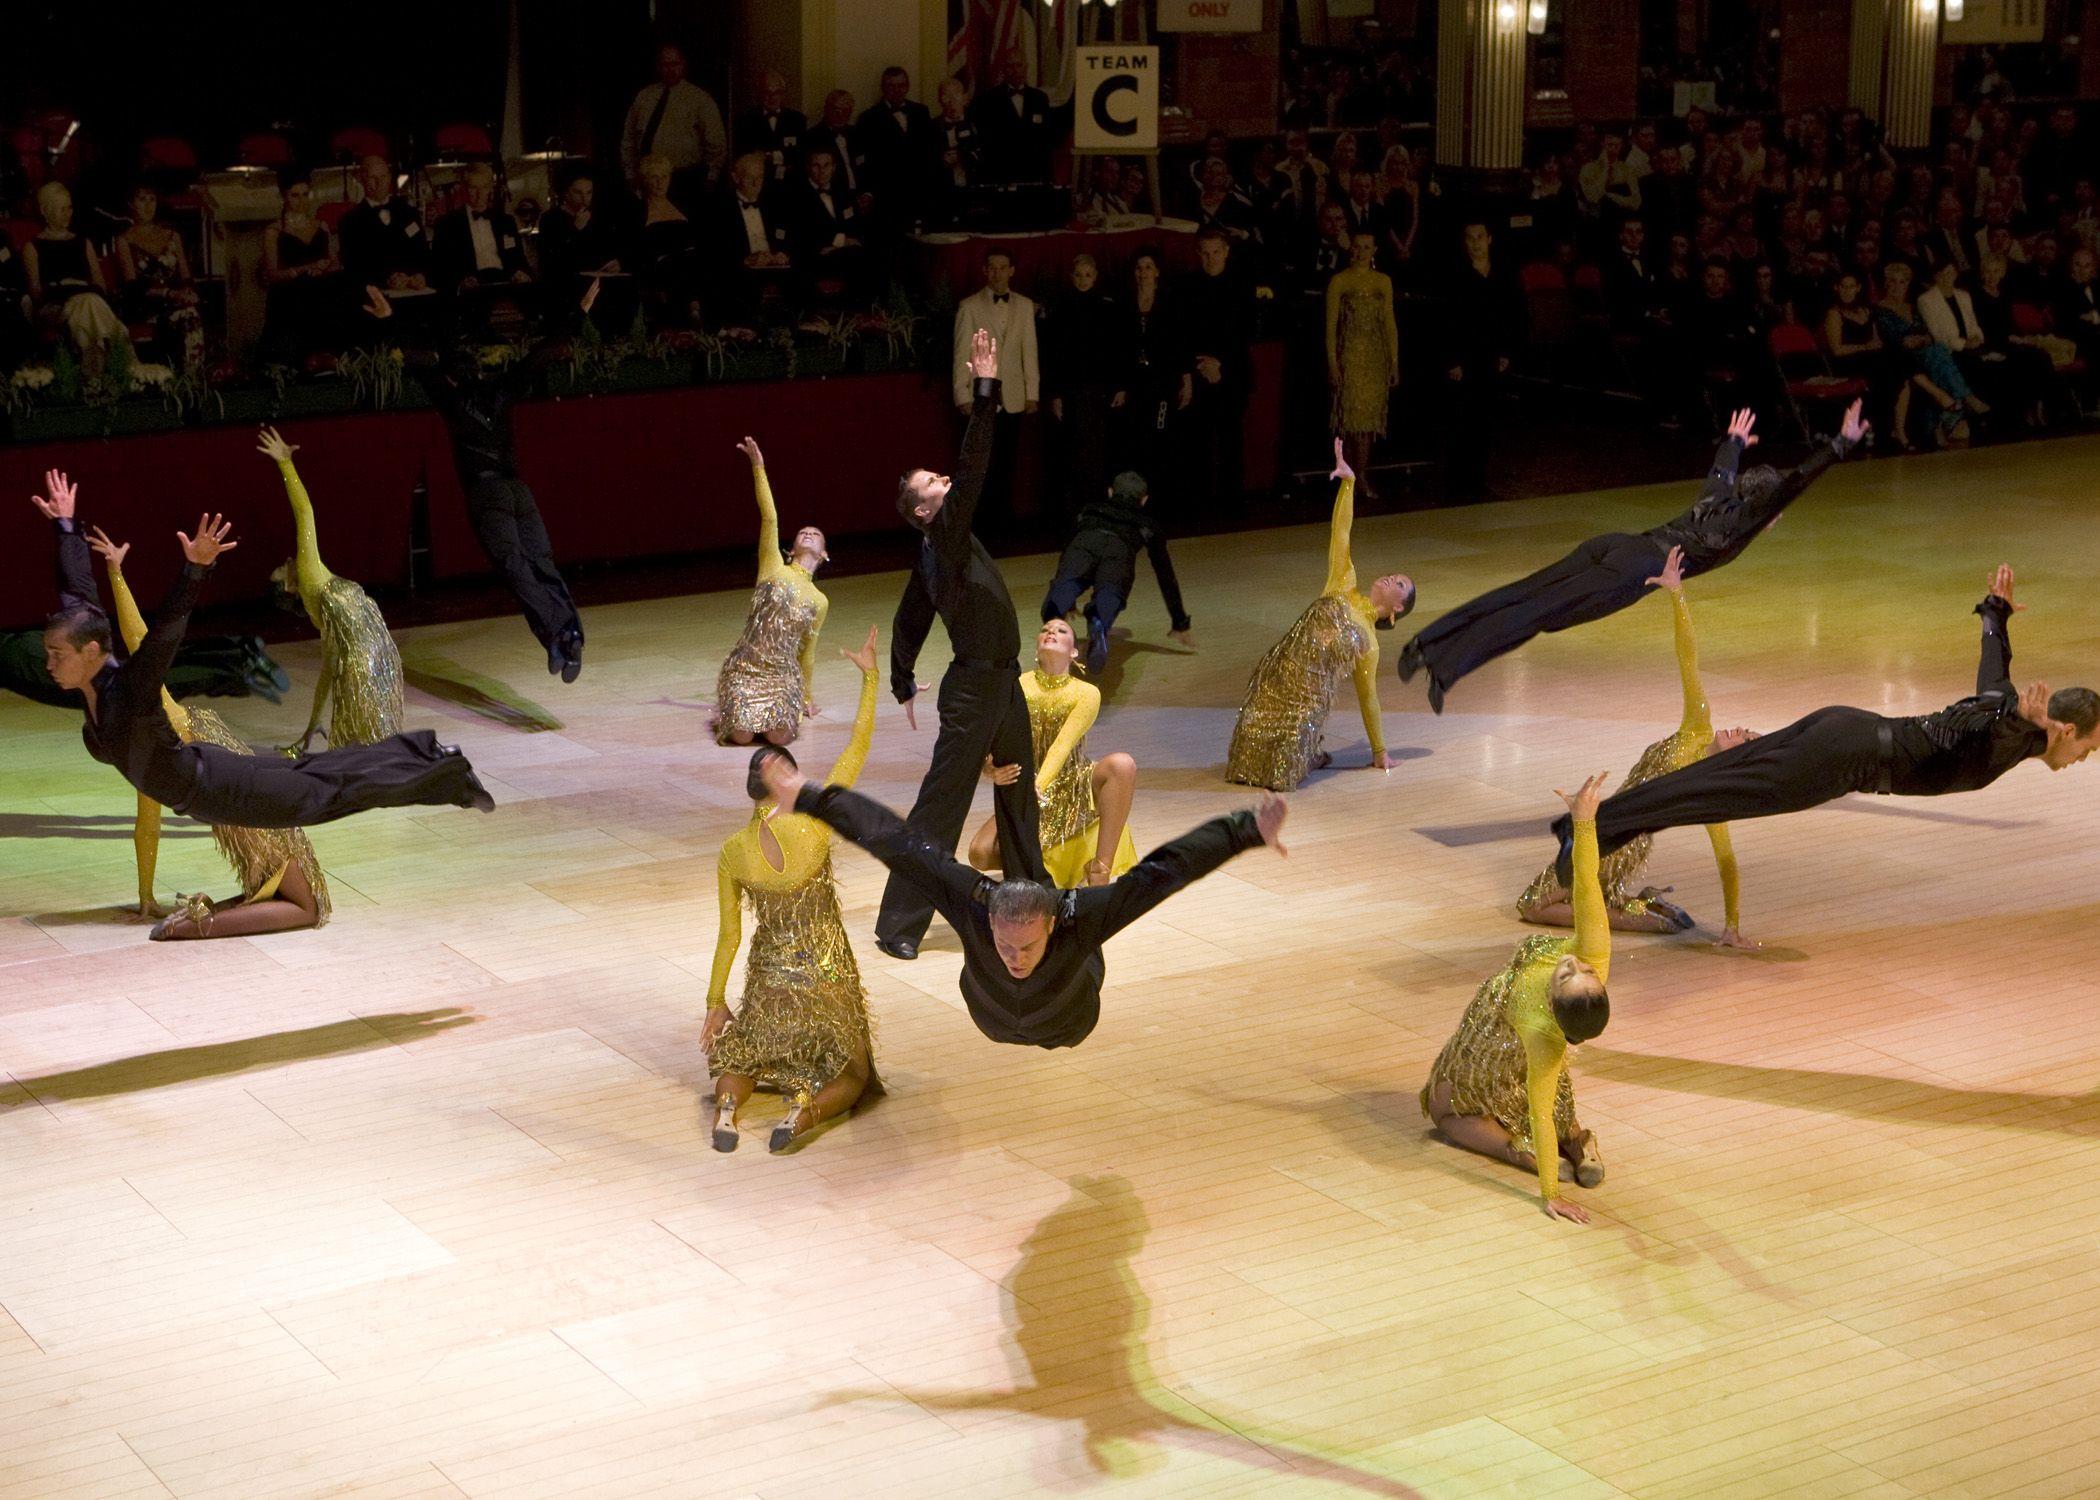 Byu Ballroom Dance Company Will Seize The Beat In Concerts April 11 12 Ballroom Dance Dance Company Dancesport